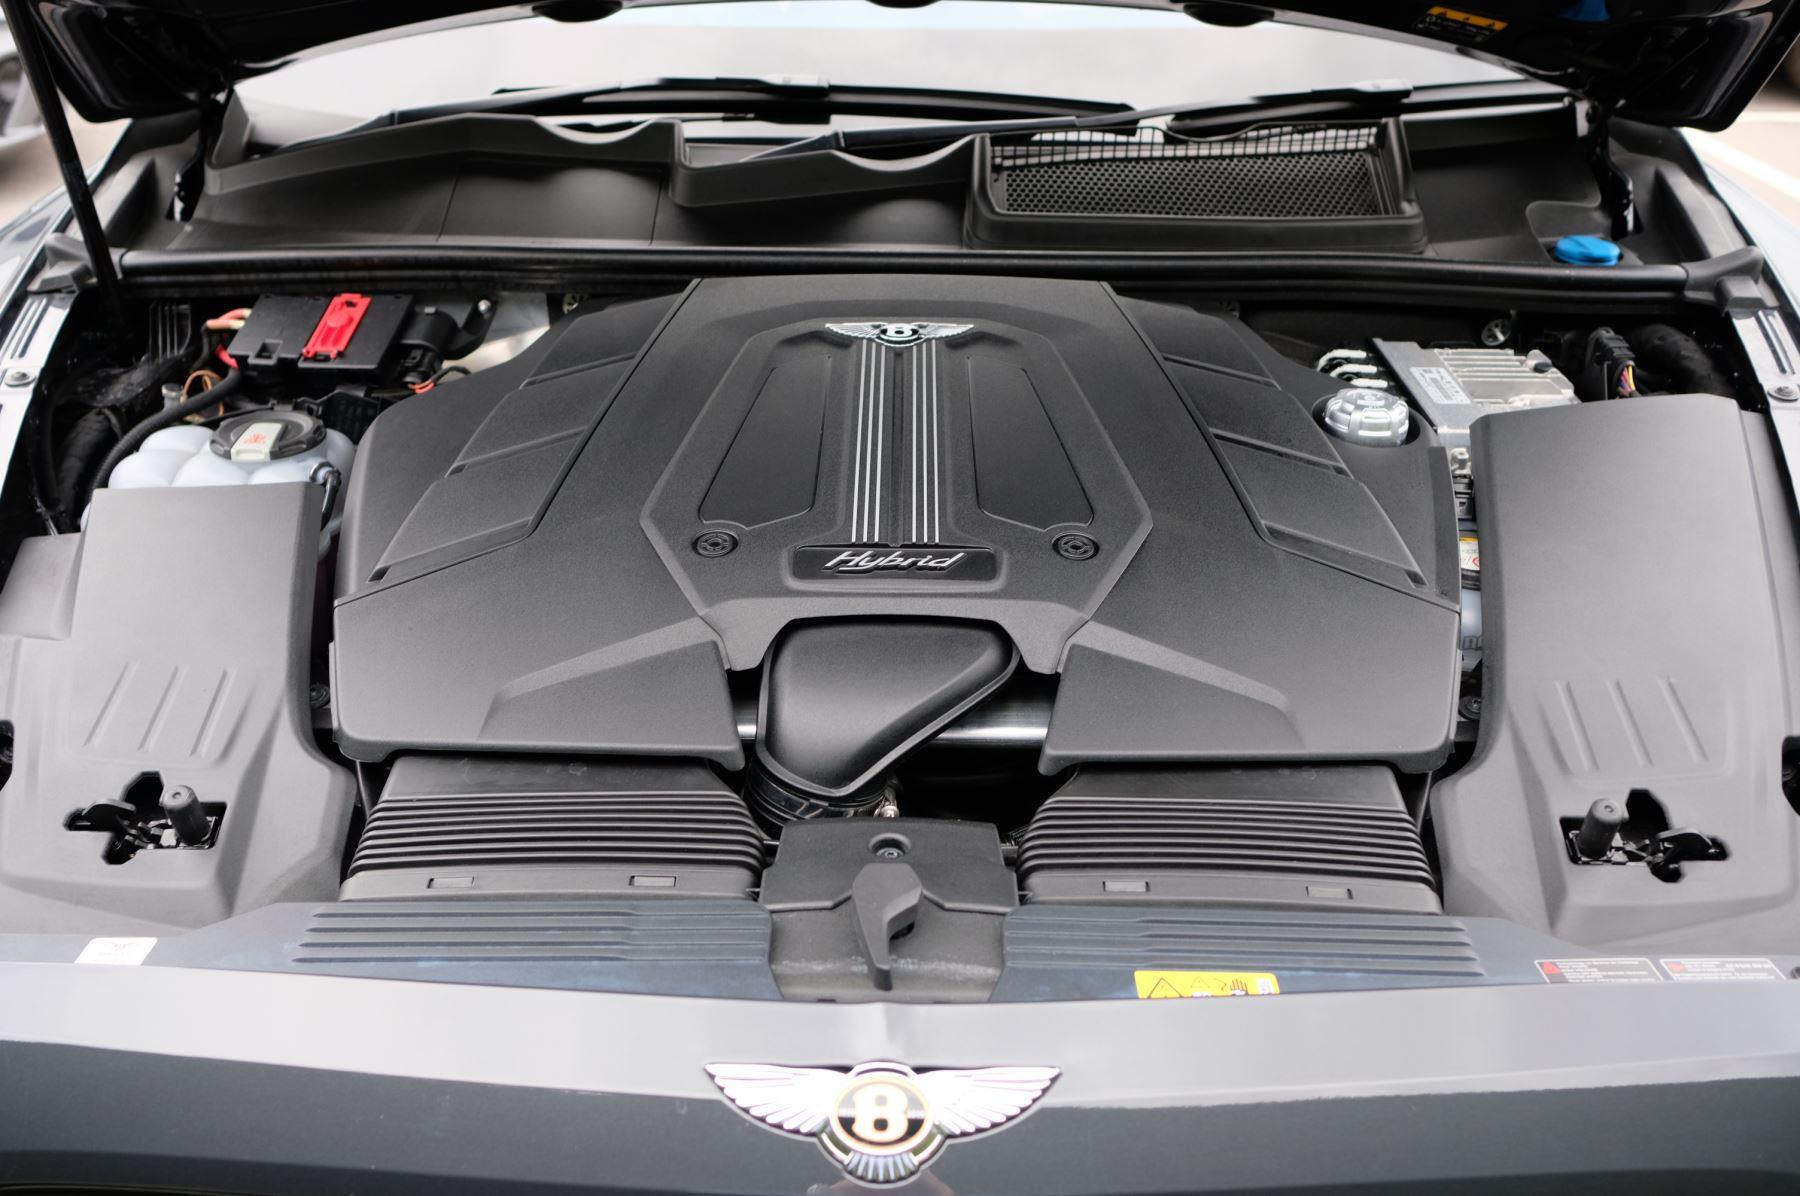 Bentley Bentayga Hybrid 3.0 V6 5dr image 10